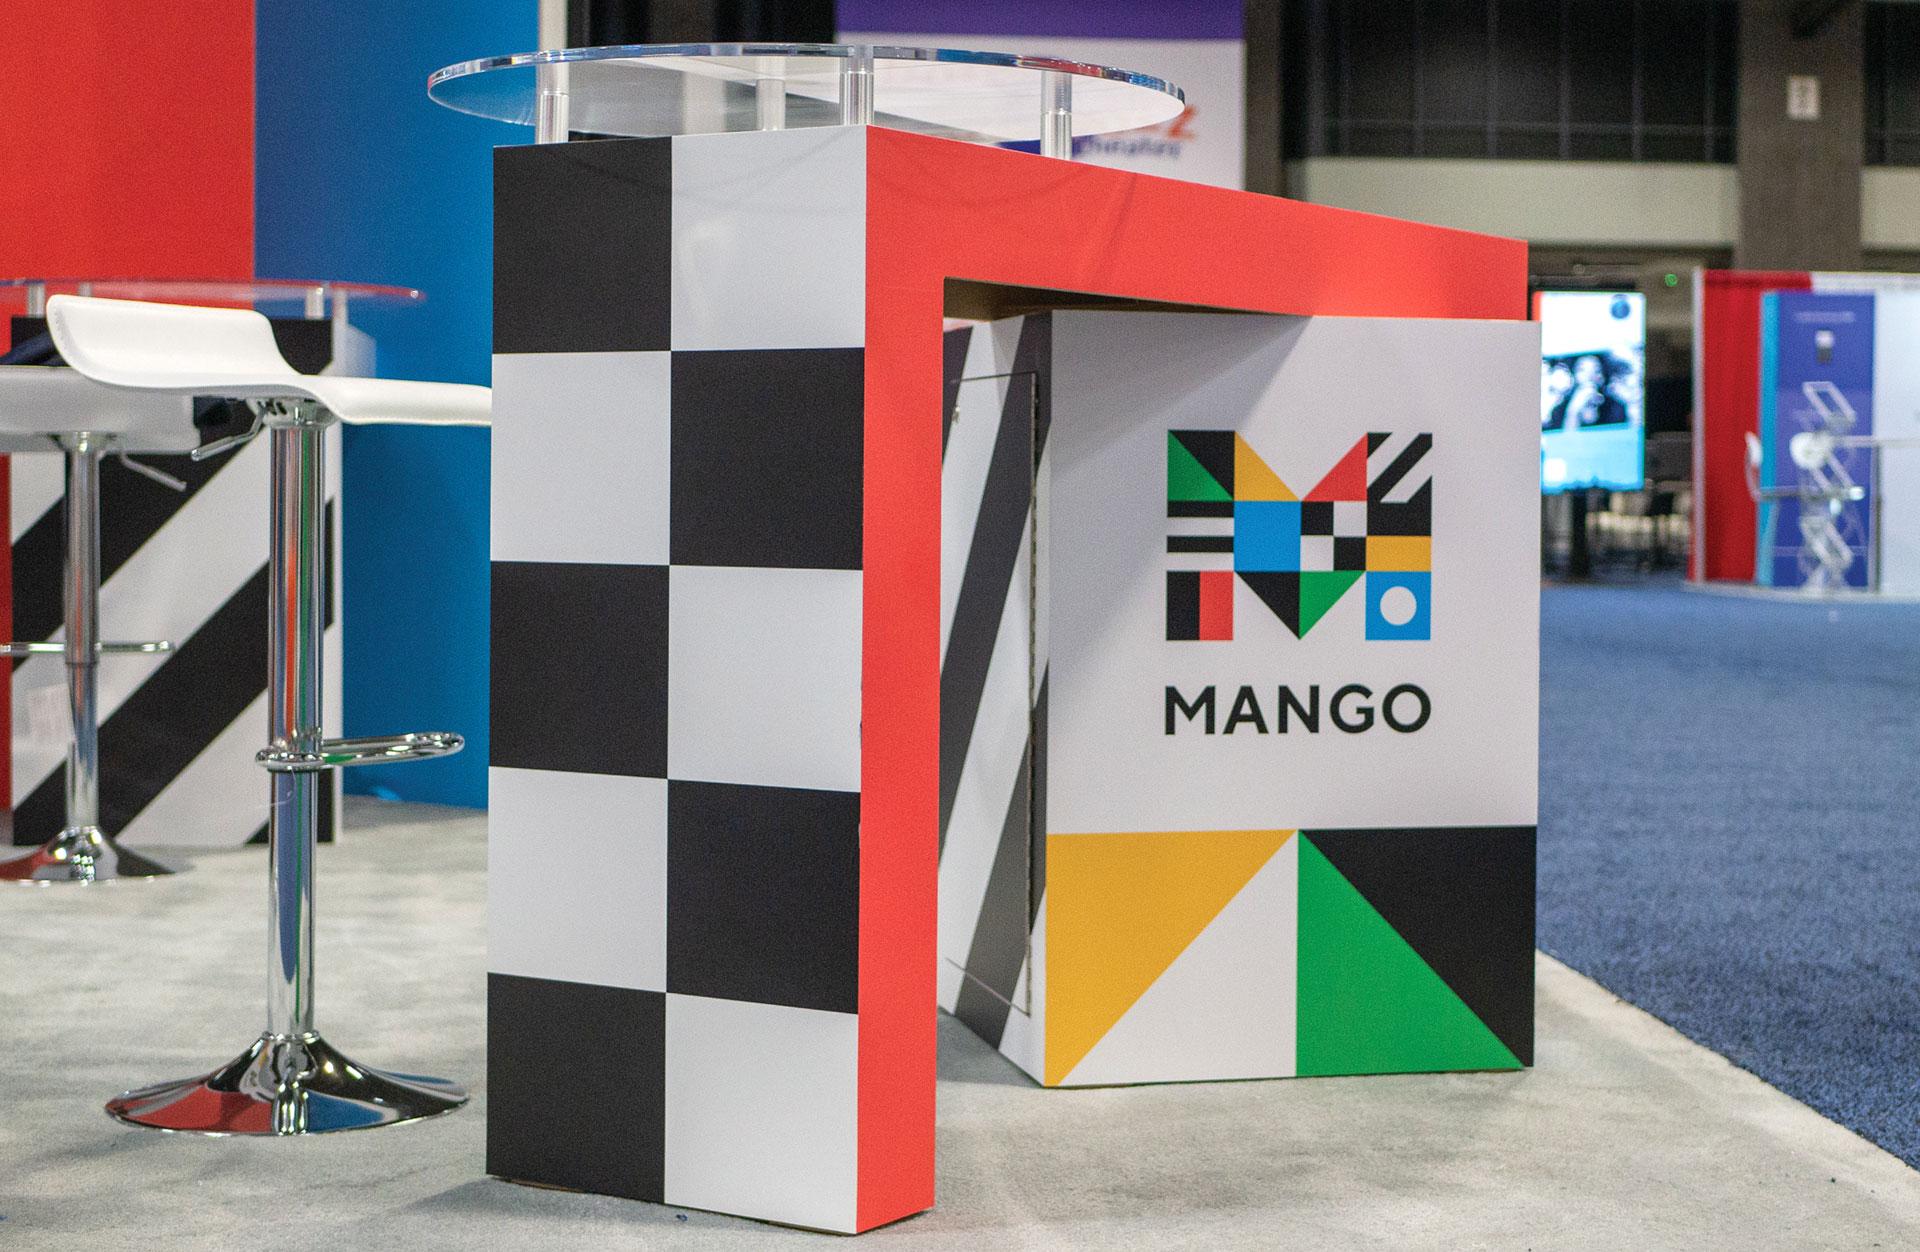 mango-booth-6.jpg